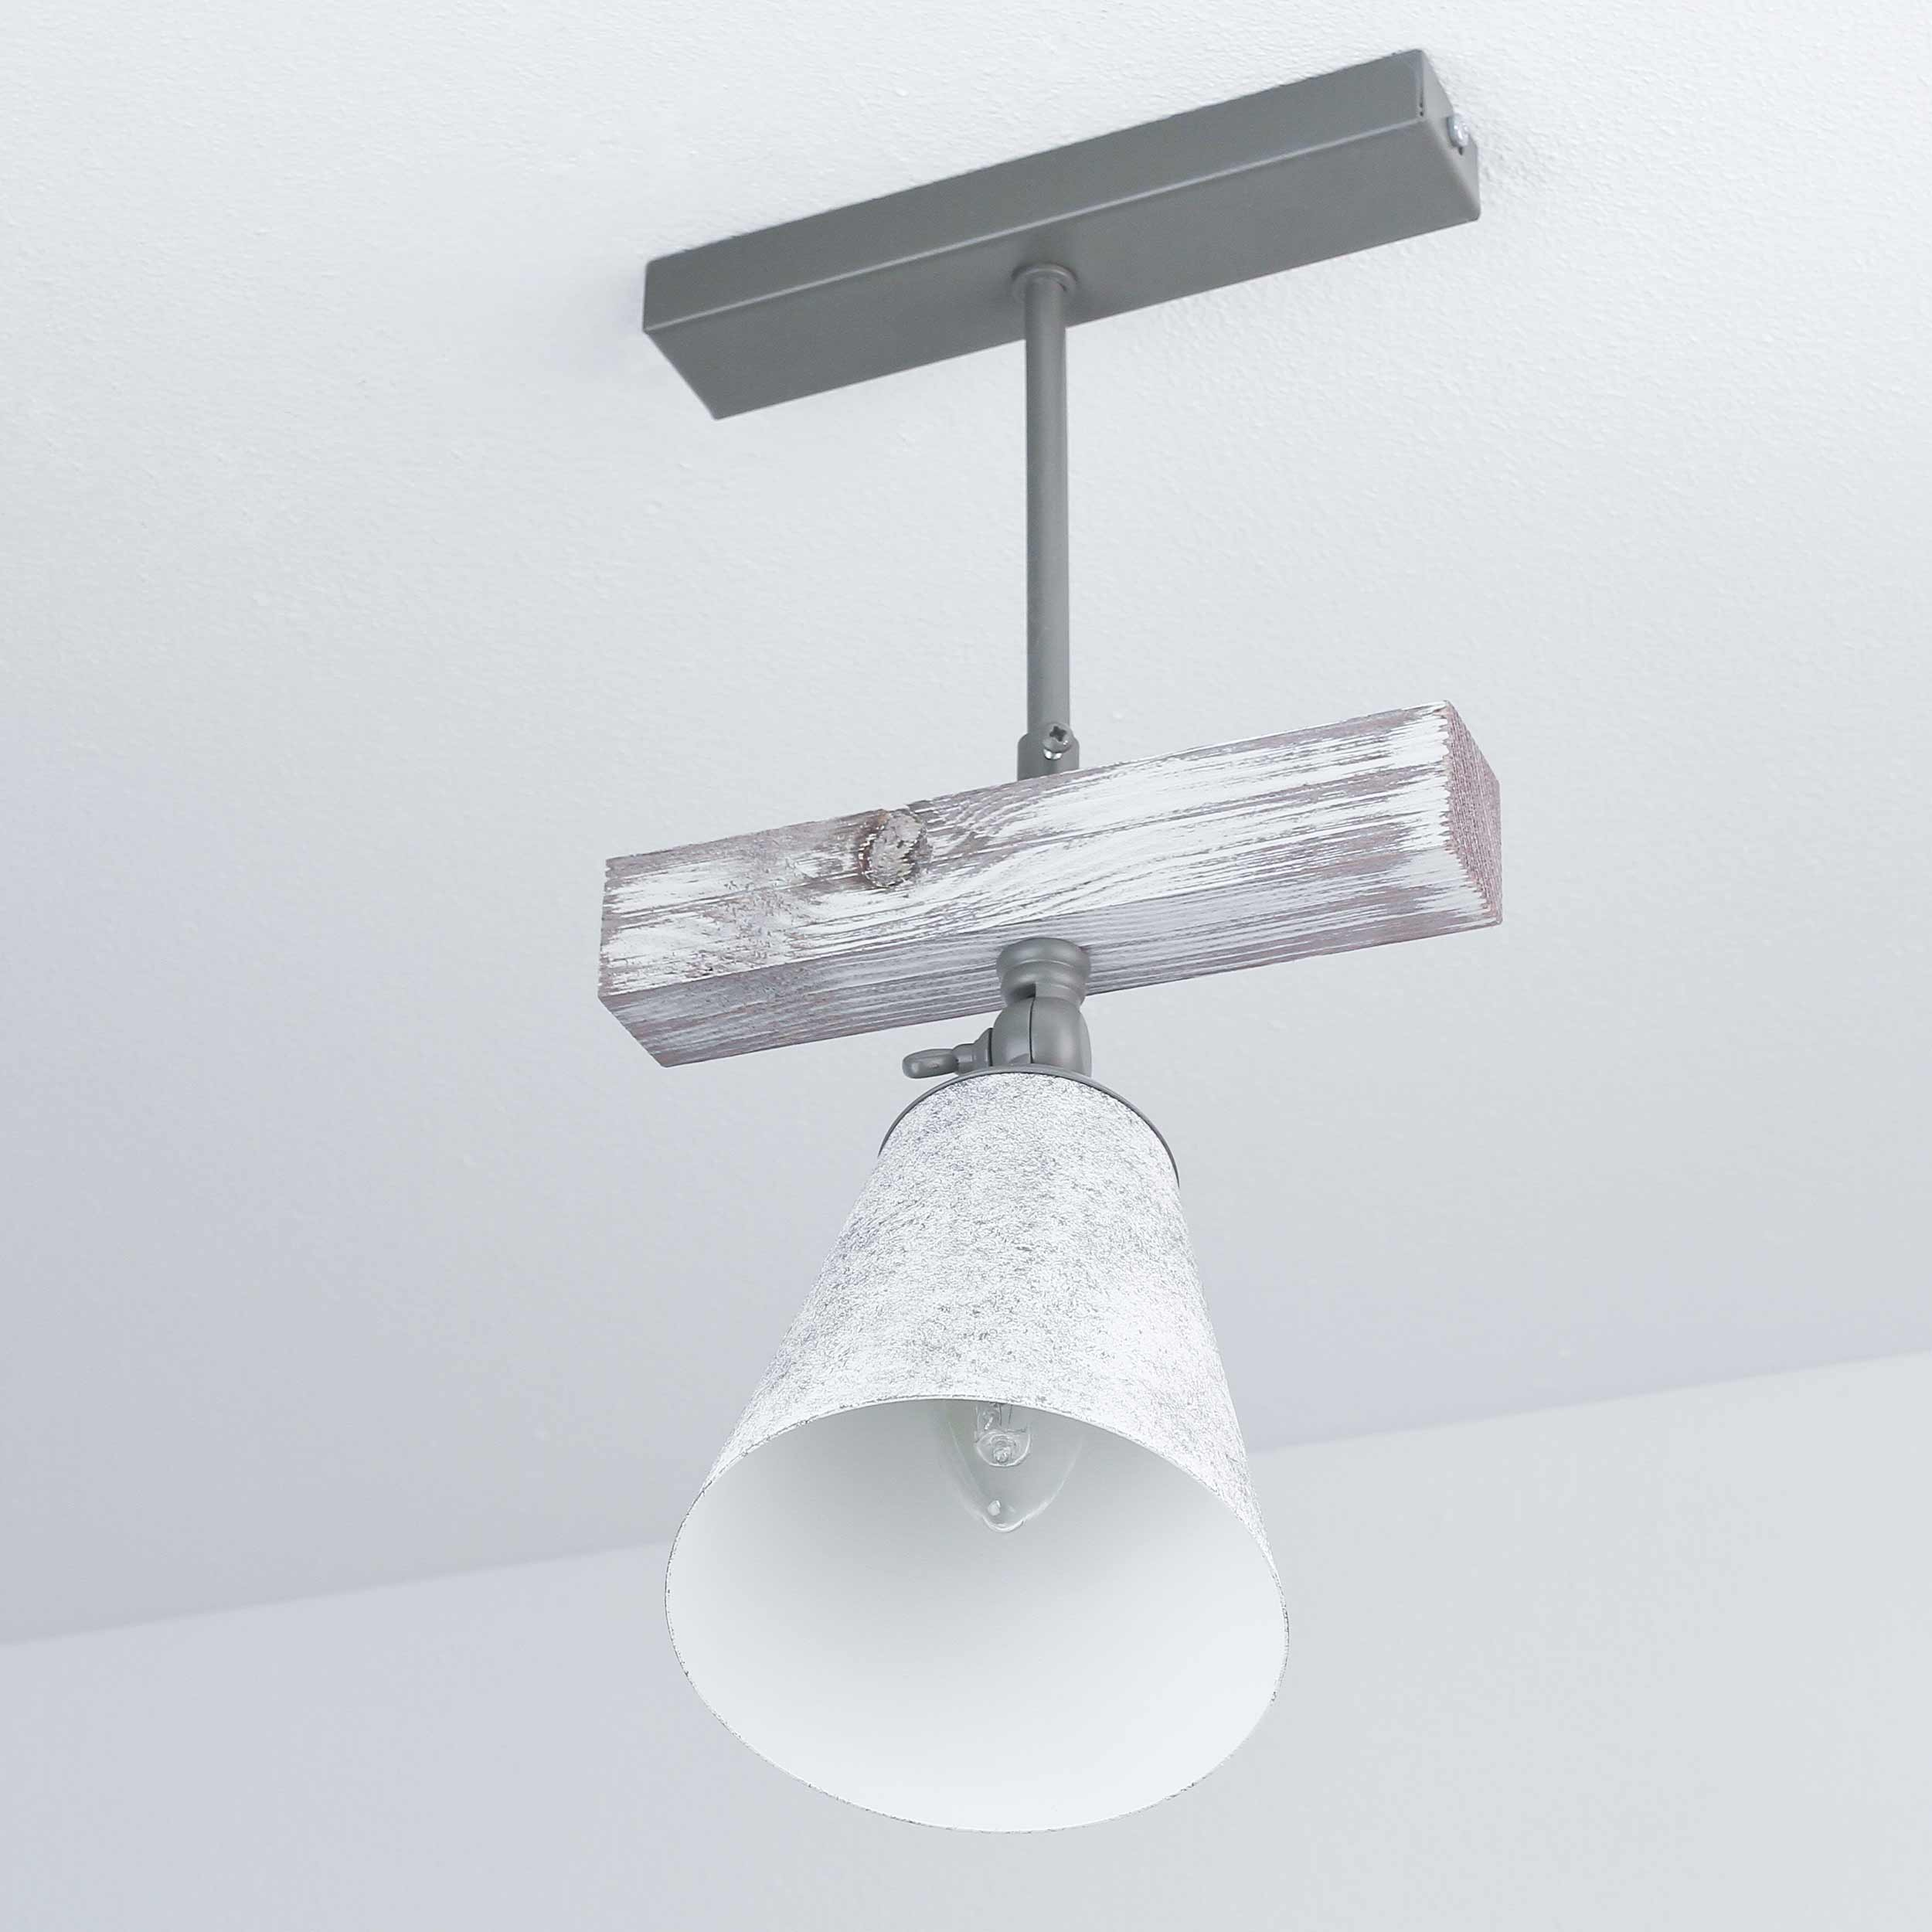 Drehbare Deckenlampe Holz Shabby Weiß Grau E27 AGAP